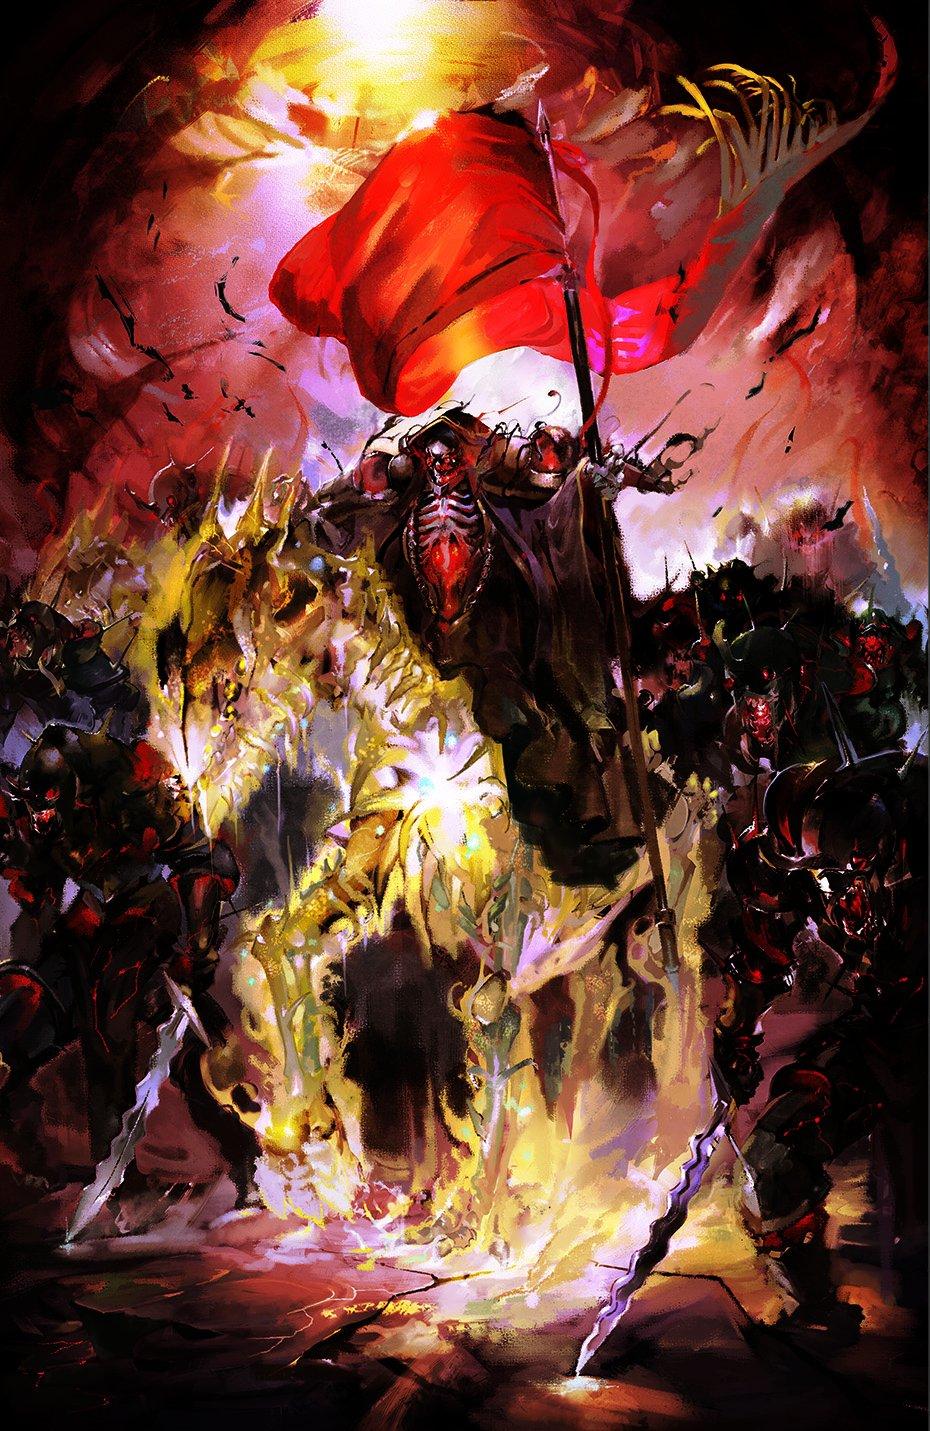 So Bin Overlord Volume 9 Cover オーバーロード アニメエクスポ オバロ